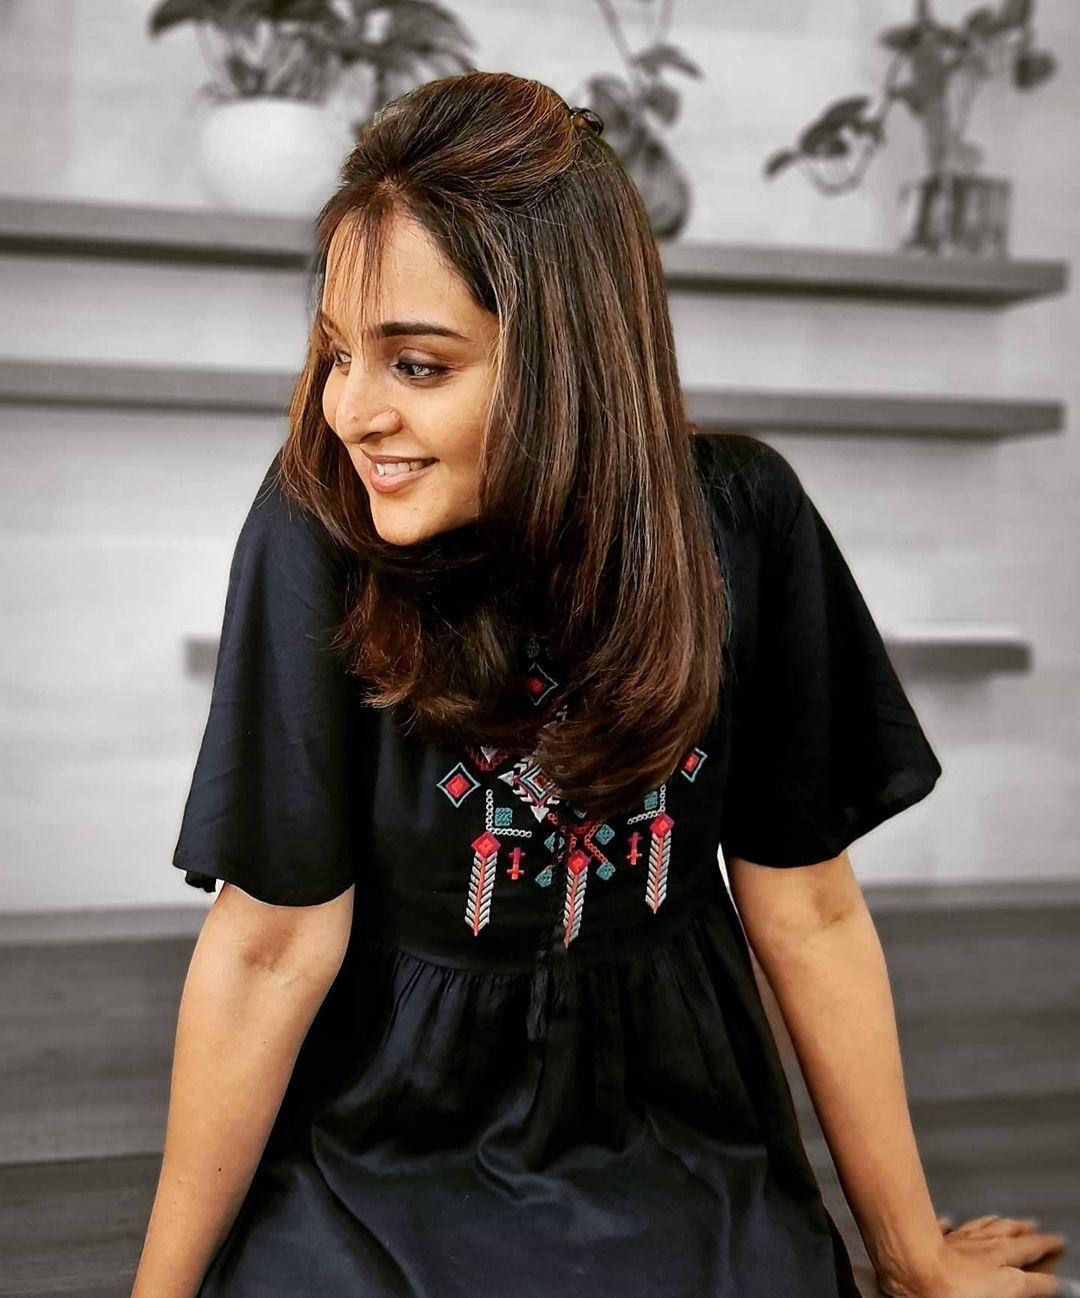 Manju new look